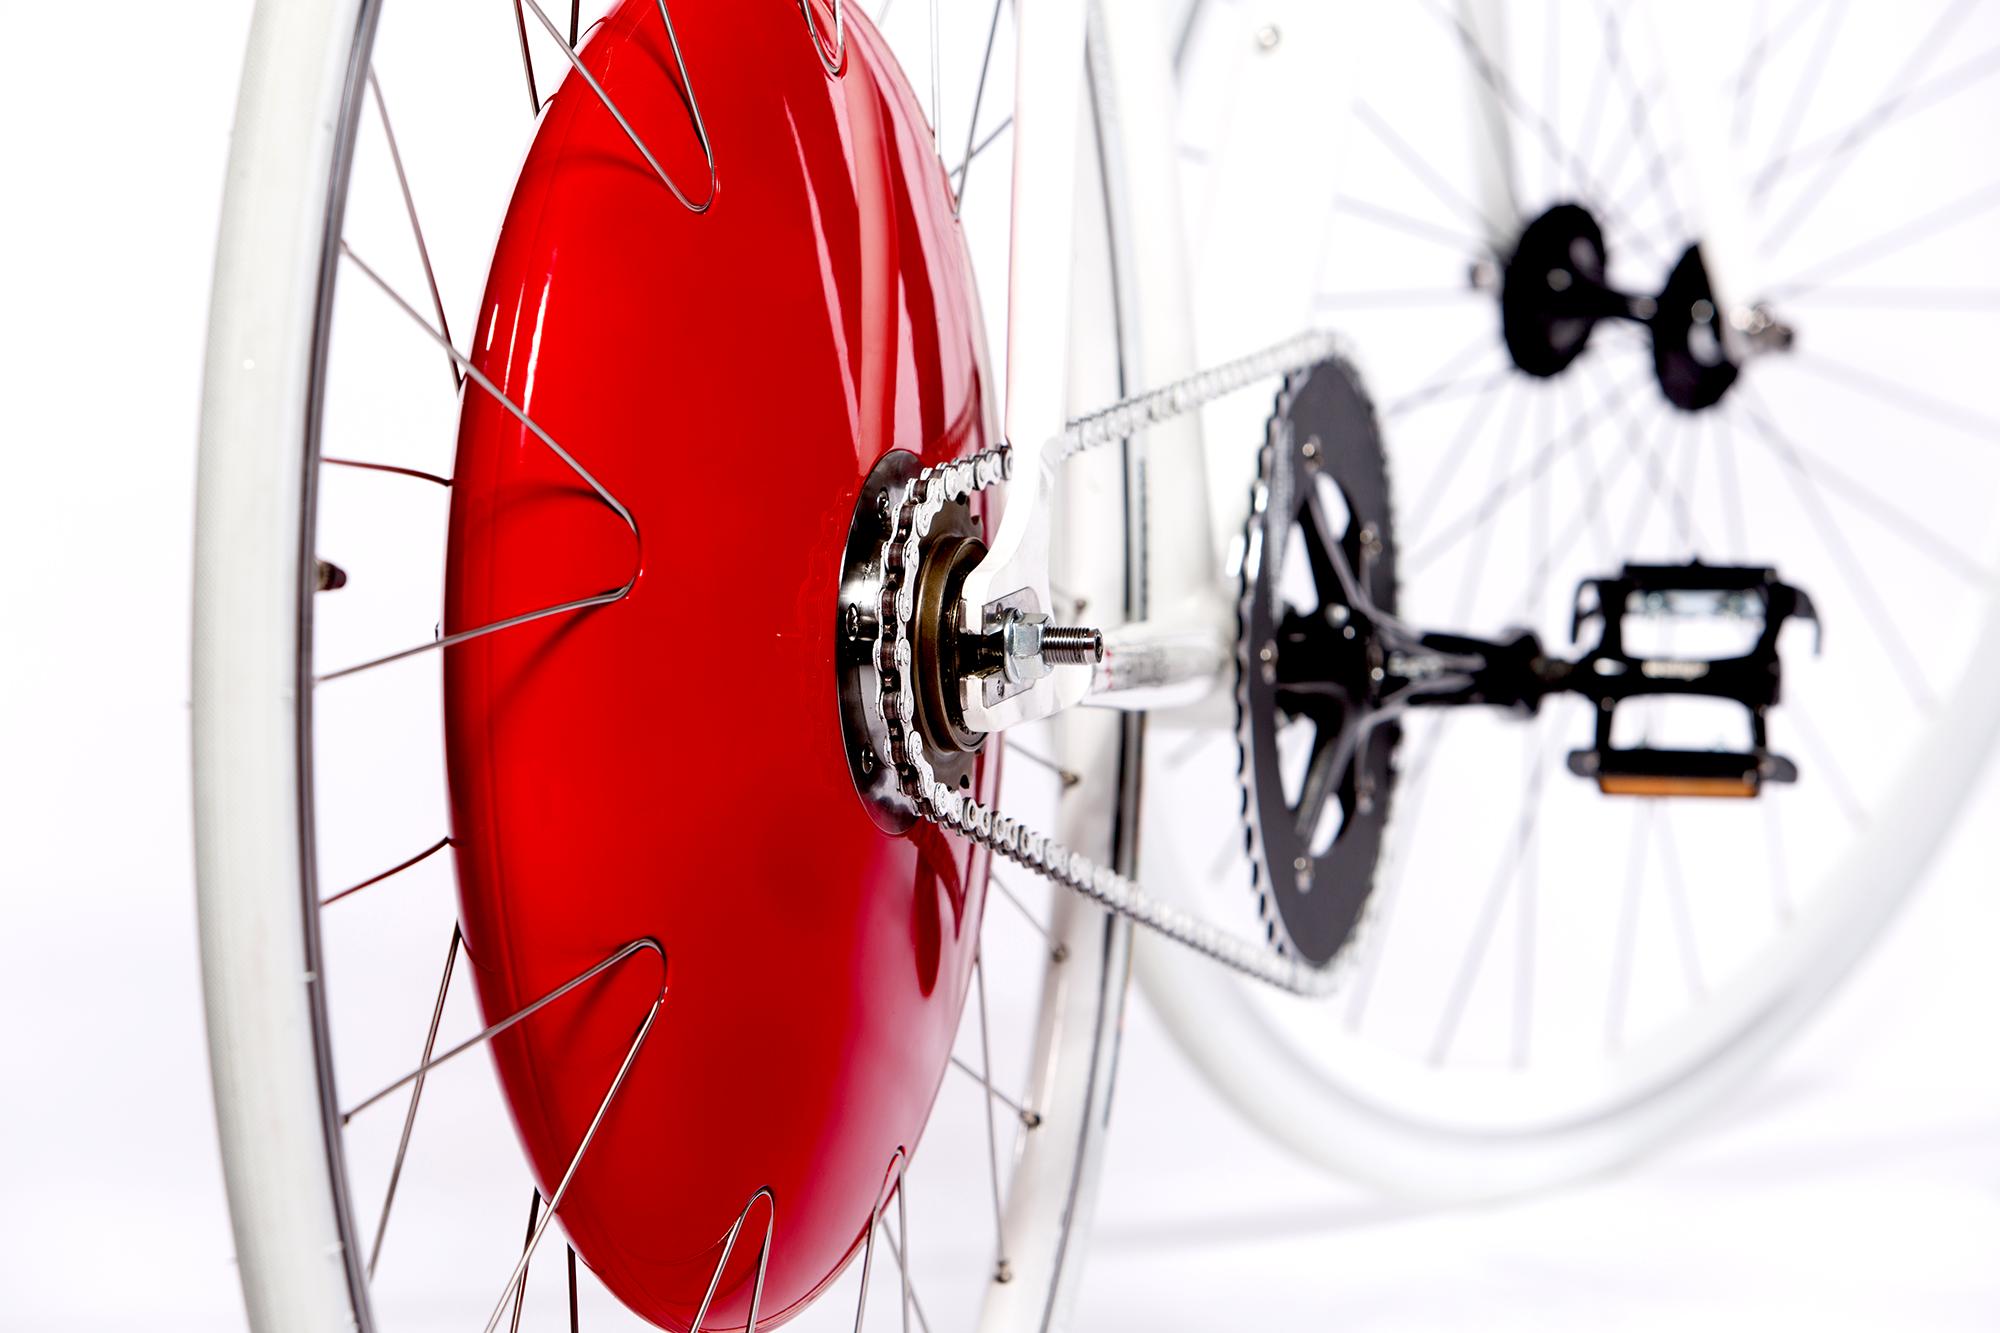 Superpedestrian - The Copenhagen Wheel